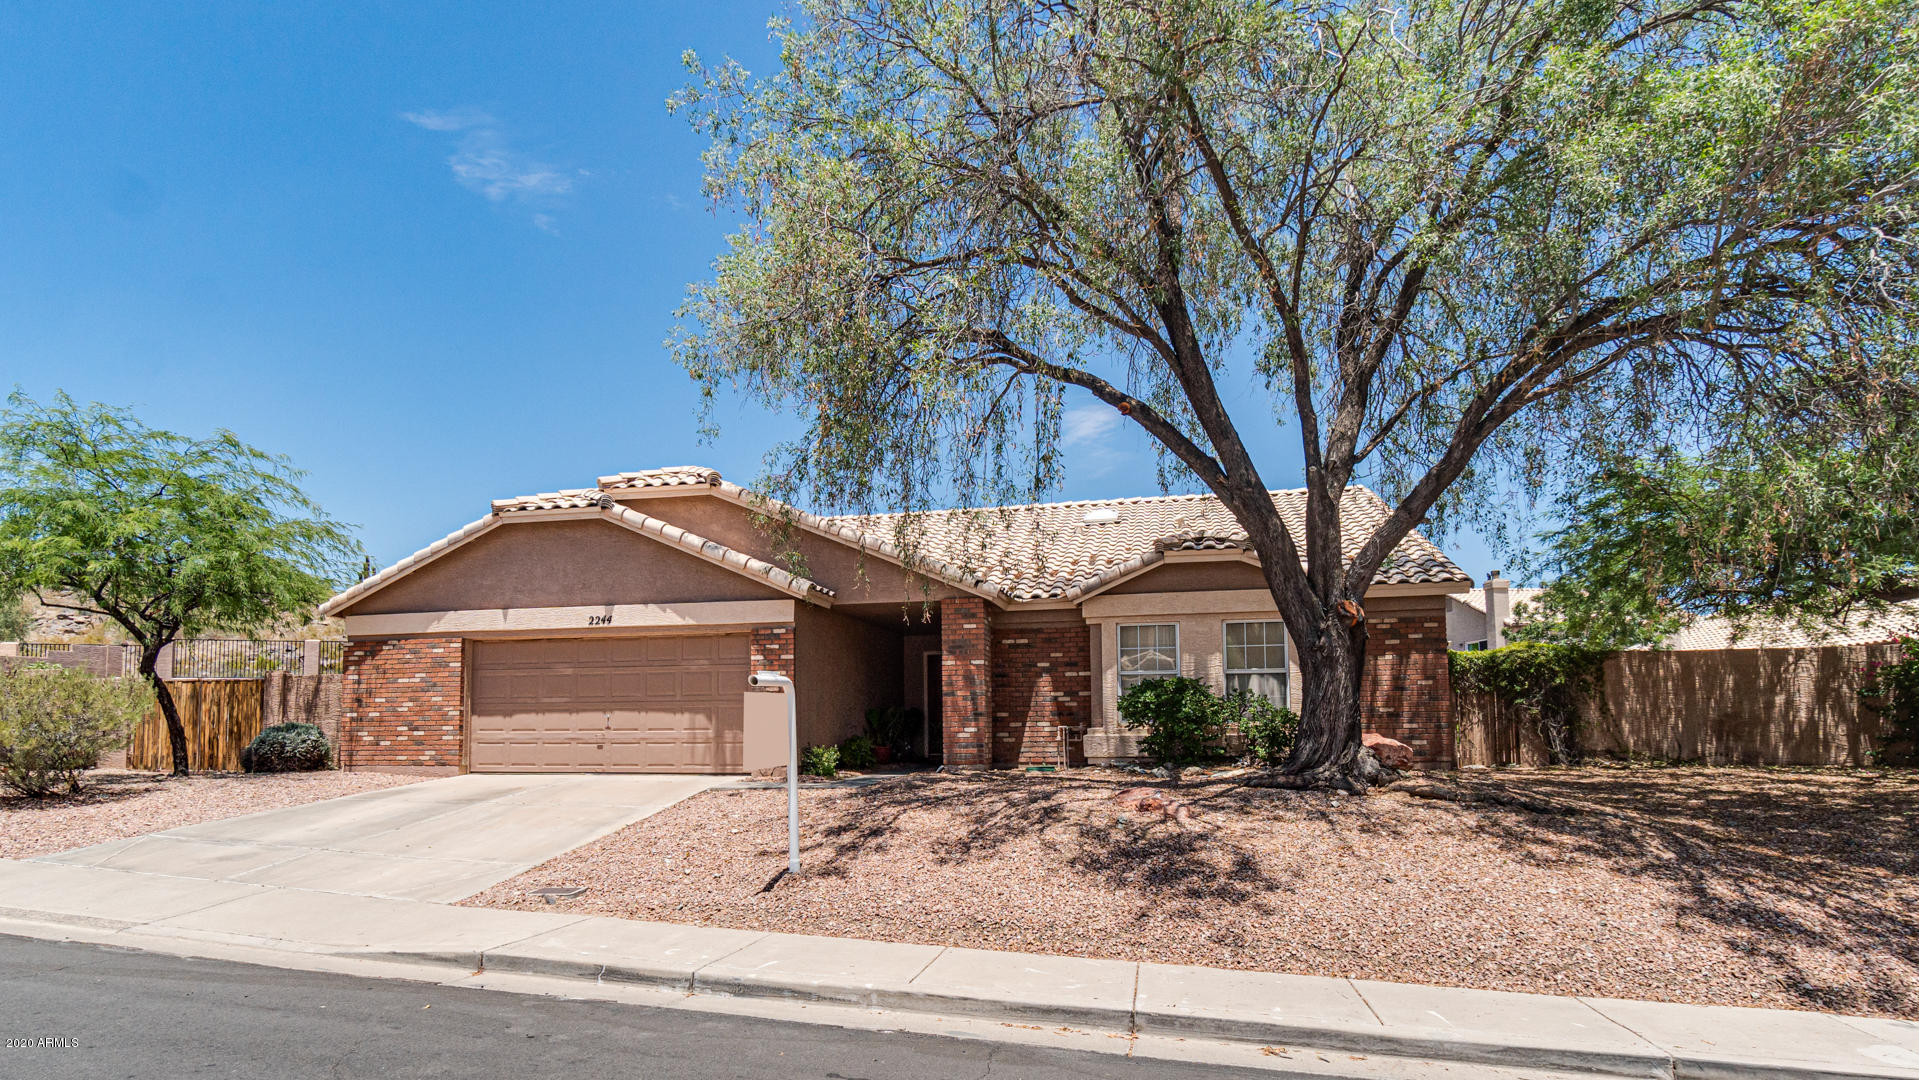 Photo of 2244 E Taxidea Way, Phoenix, AZ 85048